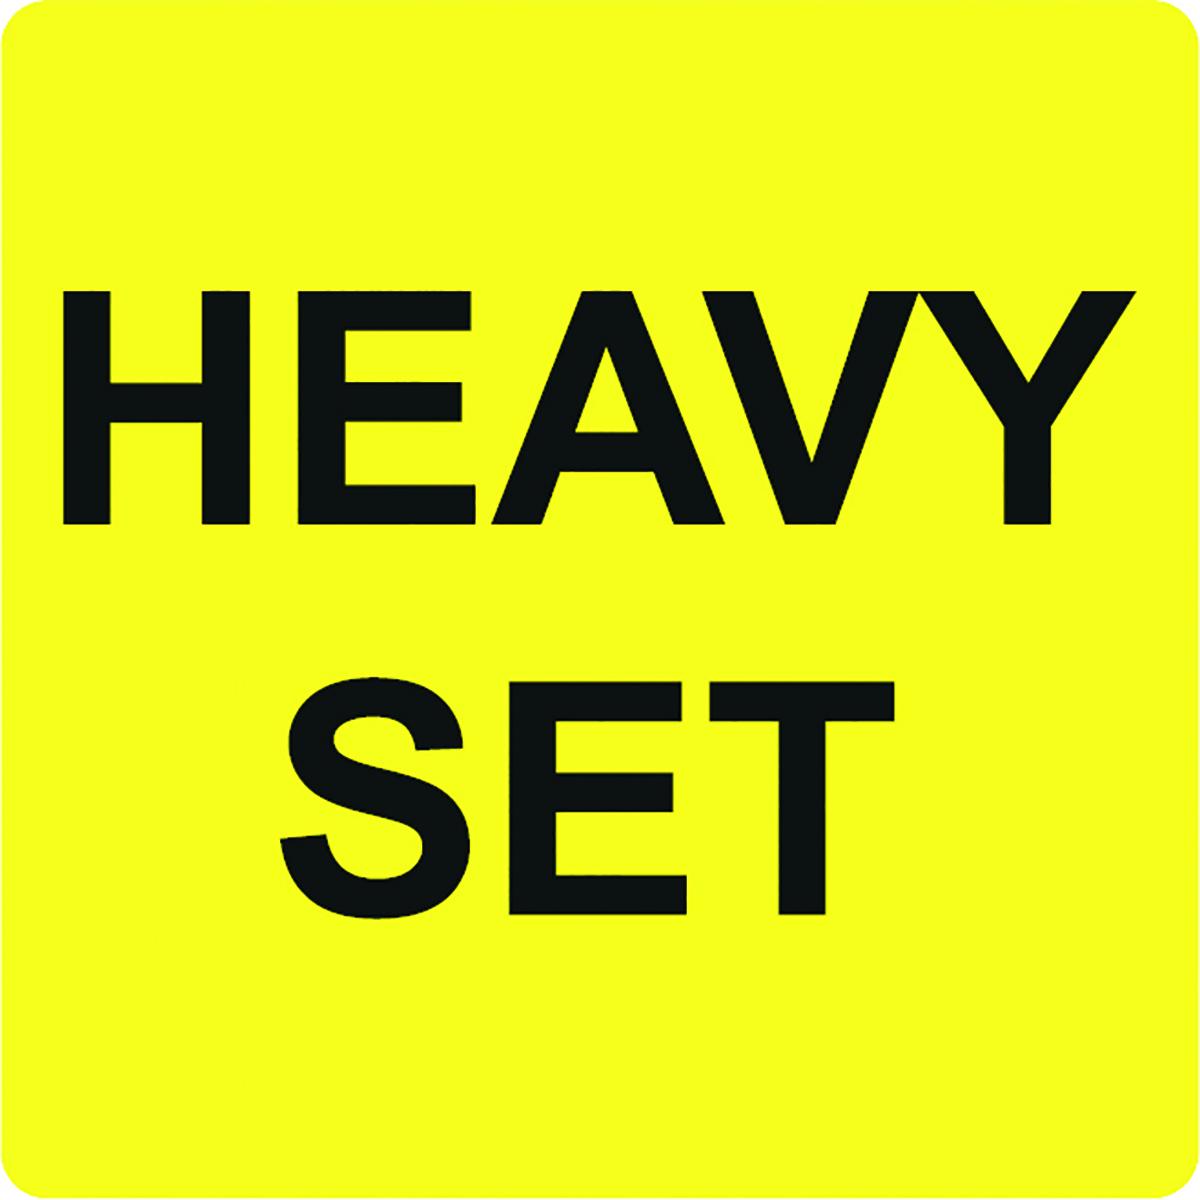 Heavy Set Alert Label  Image